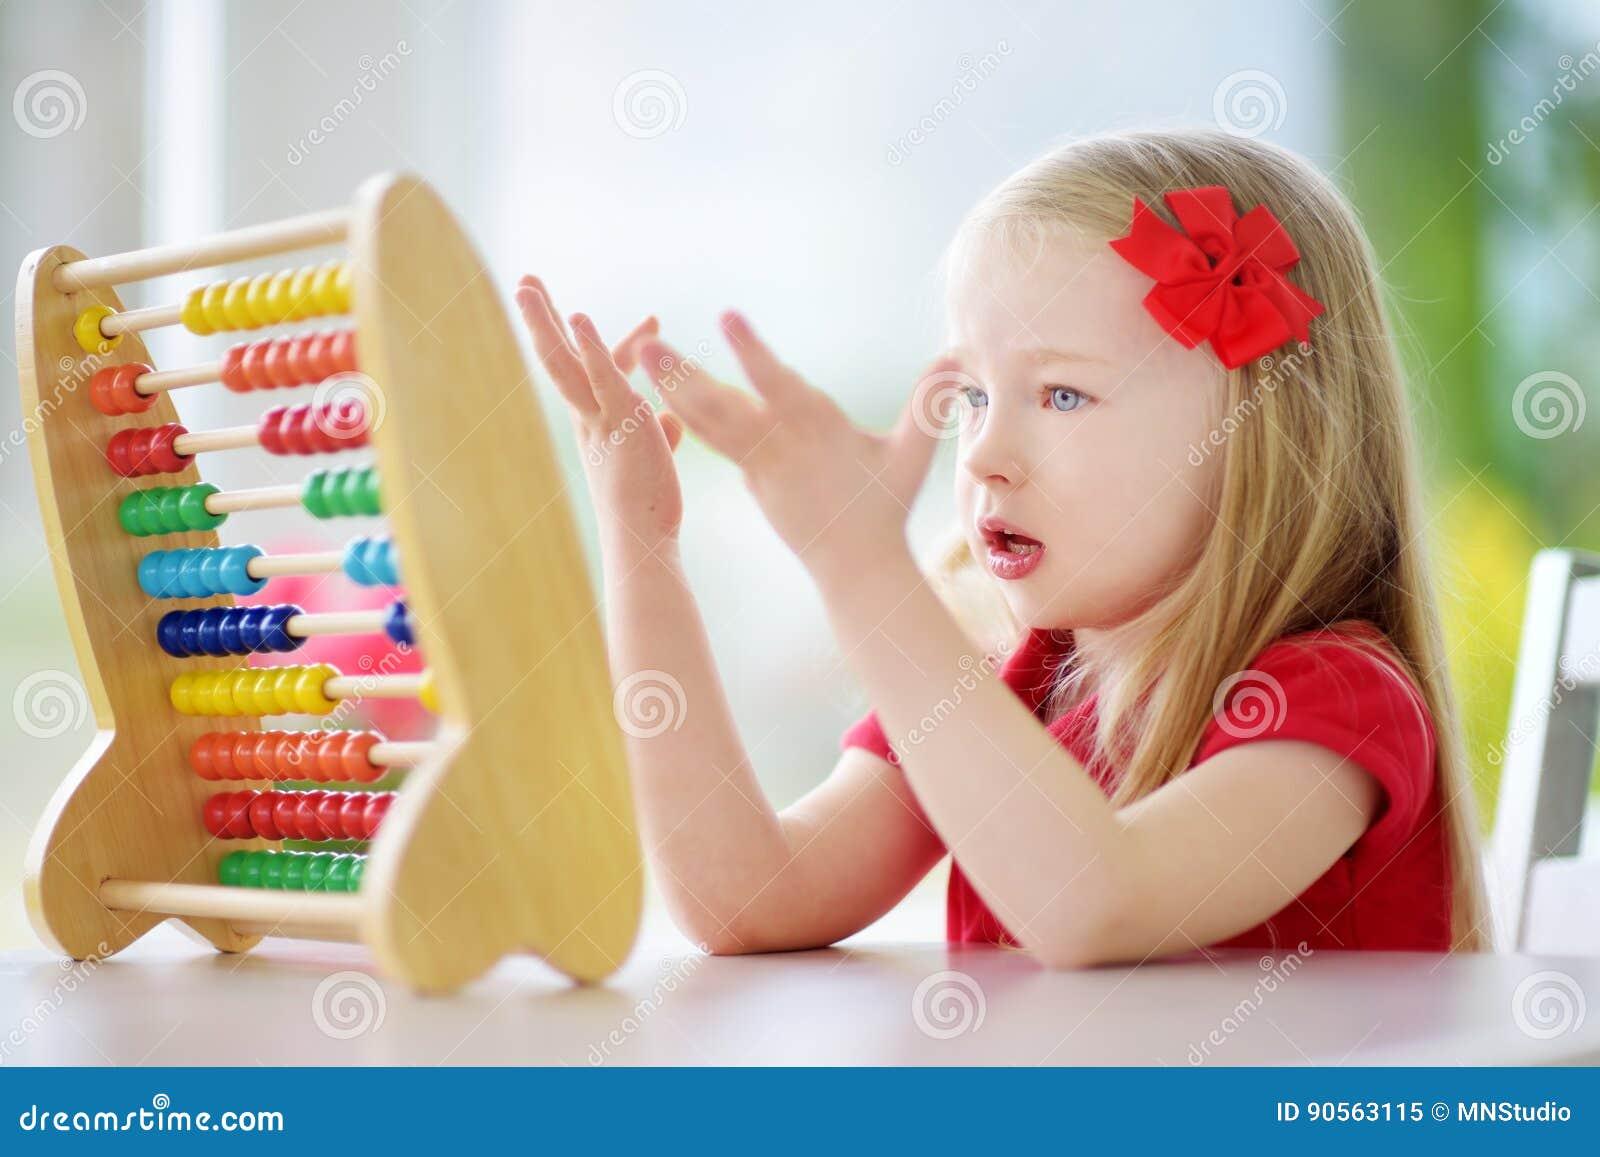 Bambina sveglia che gioca con l abaco a casa Bambino astuto che impara contare